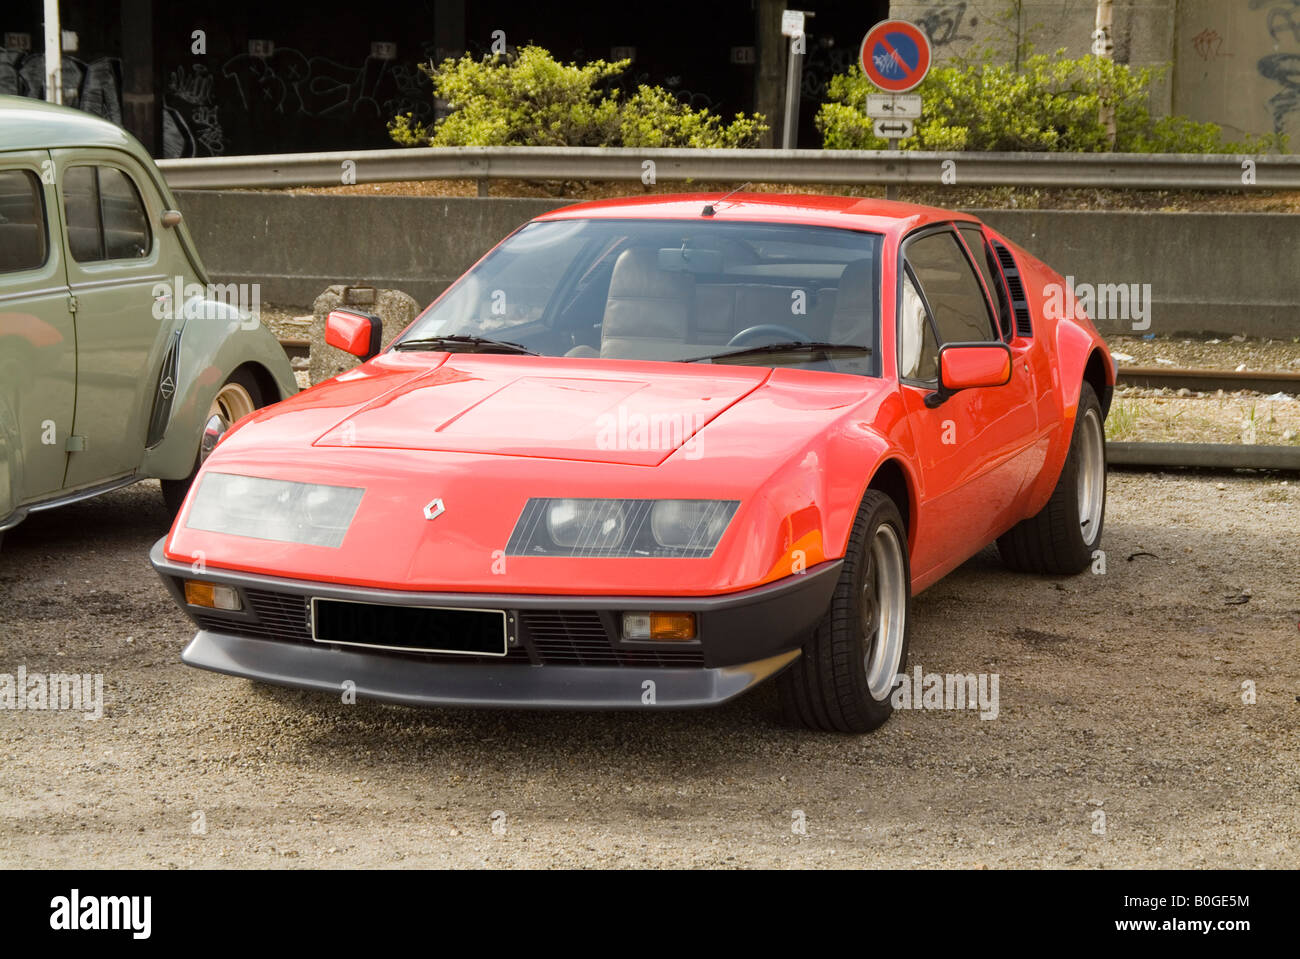 Renault Alpine Sports Car Classic Low Swoopy Sleak French France Stock Photo Alamy